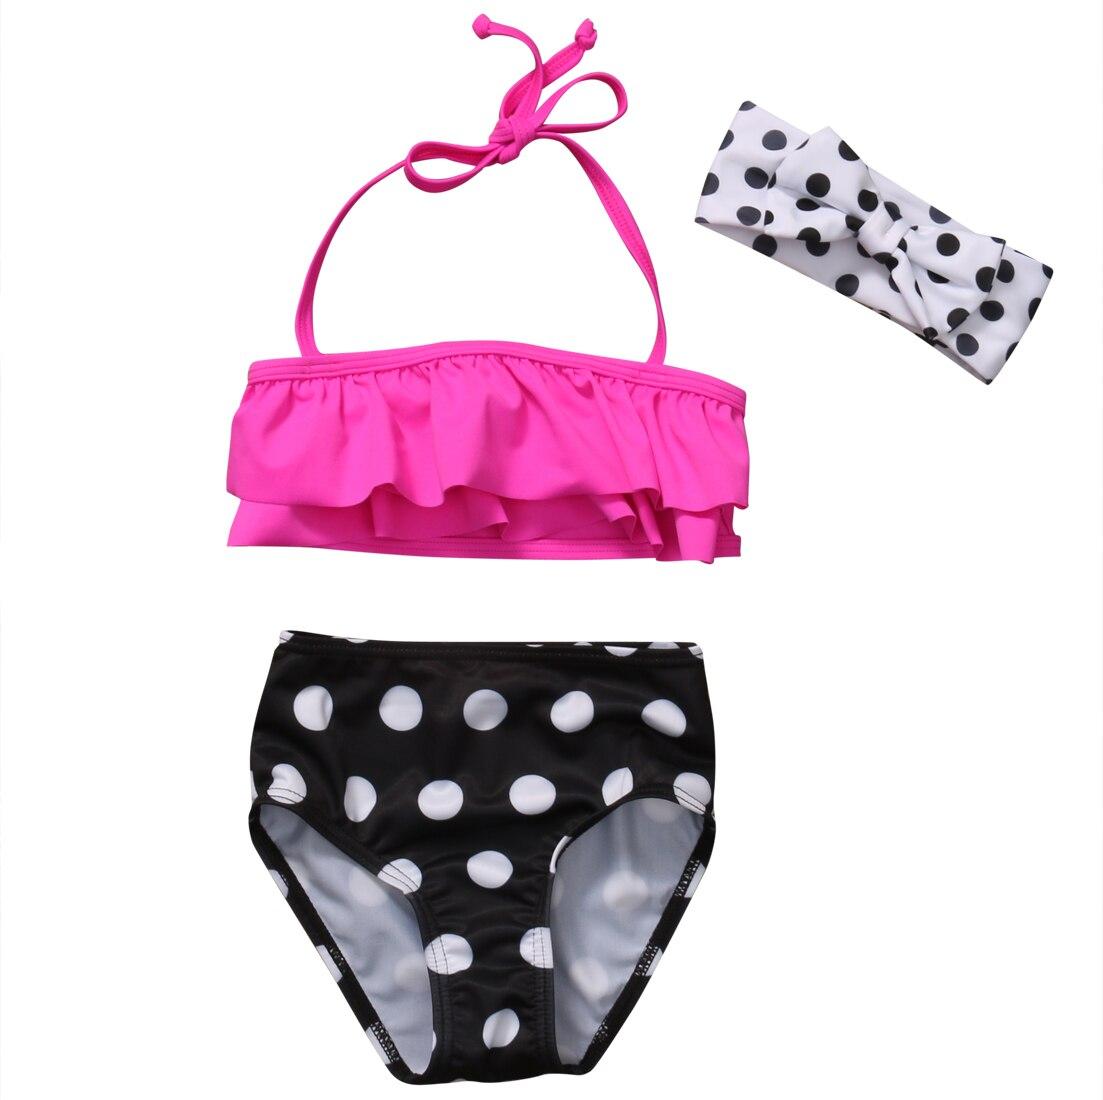 1-6Y Summer Toddler Kids Baby Girl Ruffles Strap Tops Polka Dot Shorts Headband Bikini Set Swimwear Beachwear Bathing Suit 3PCS